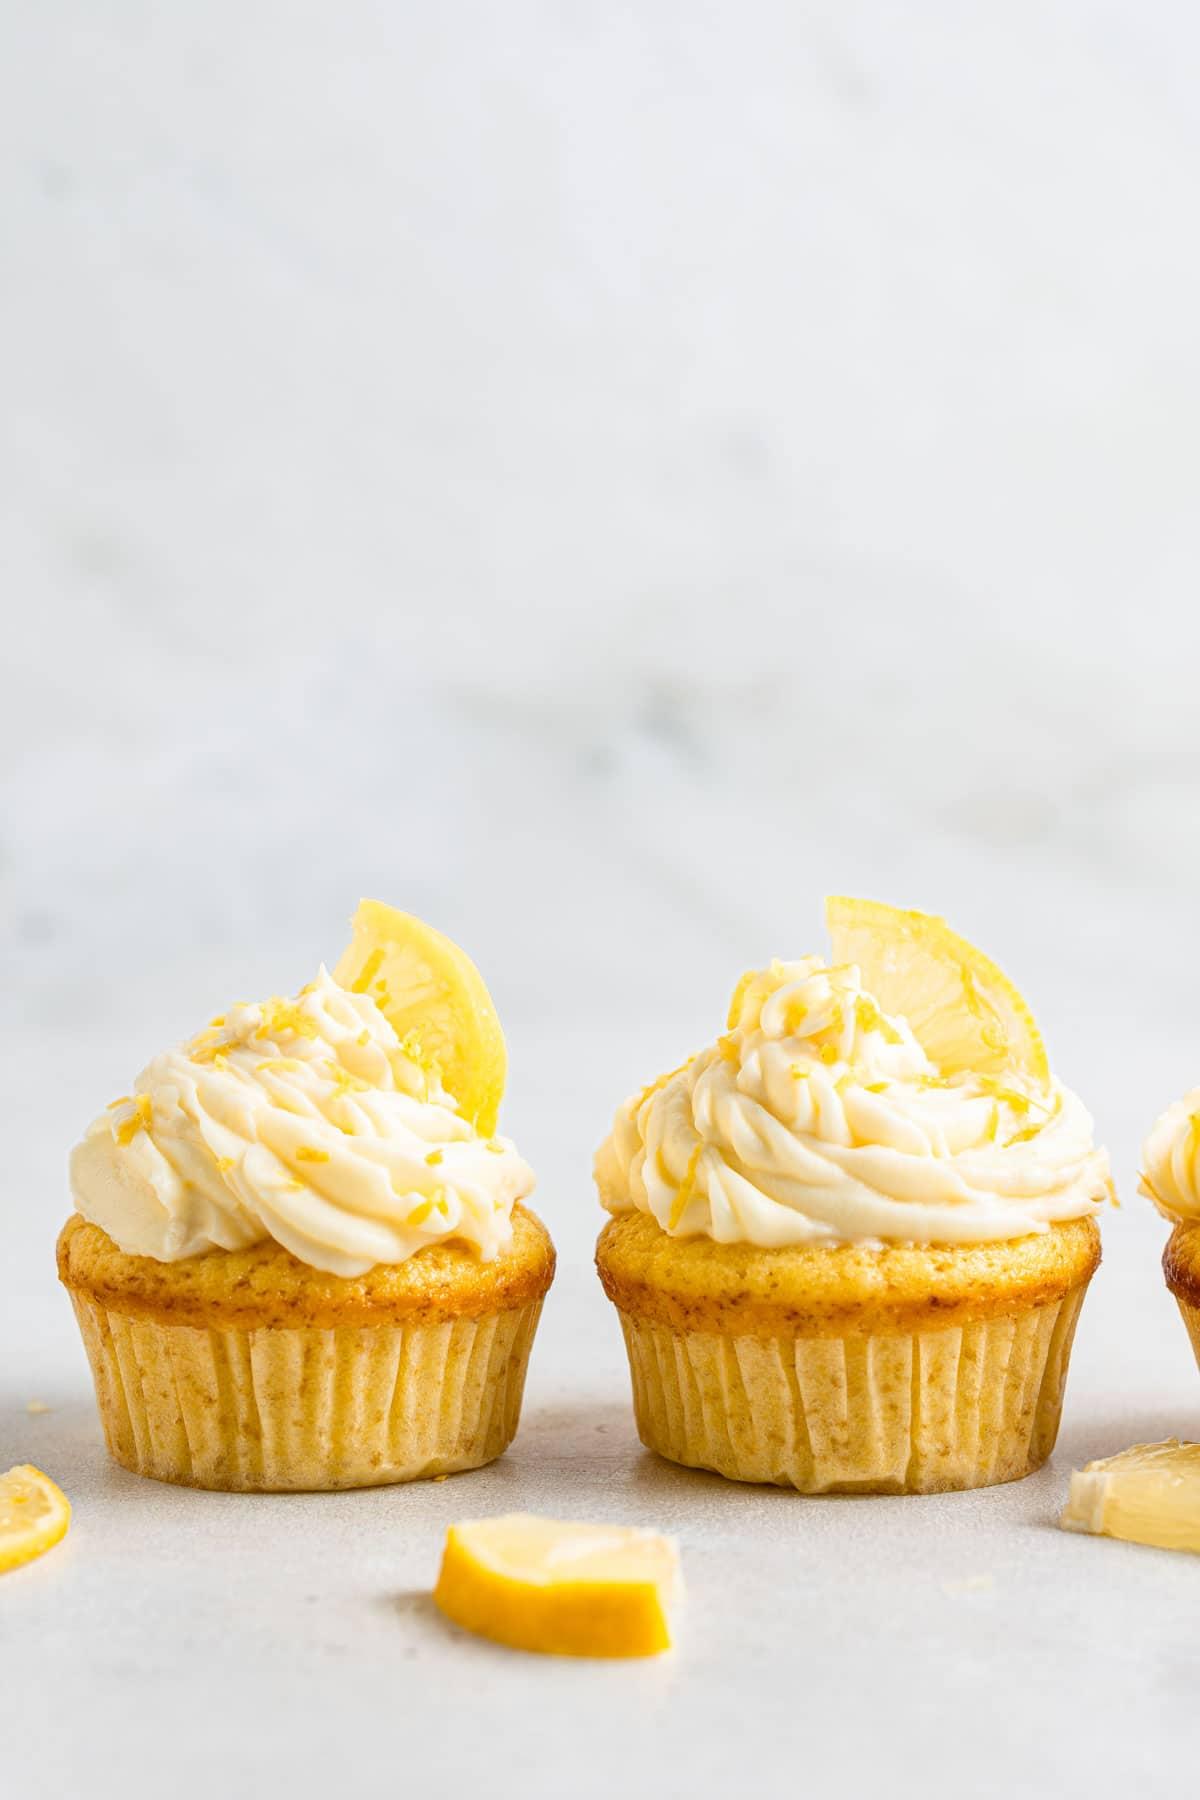 Two lemon cupcakes with fresh lemon slices.